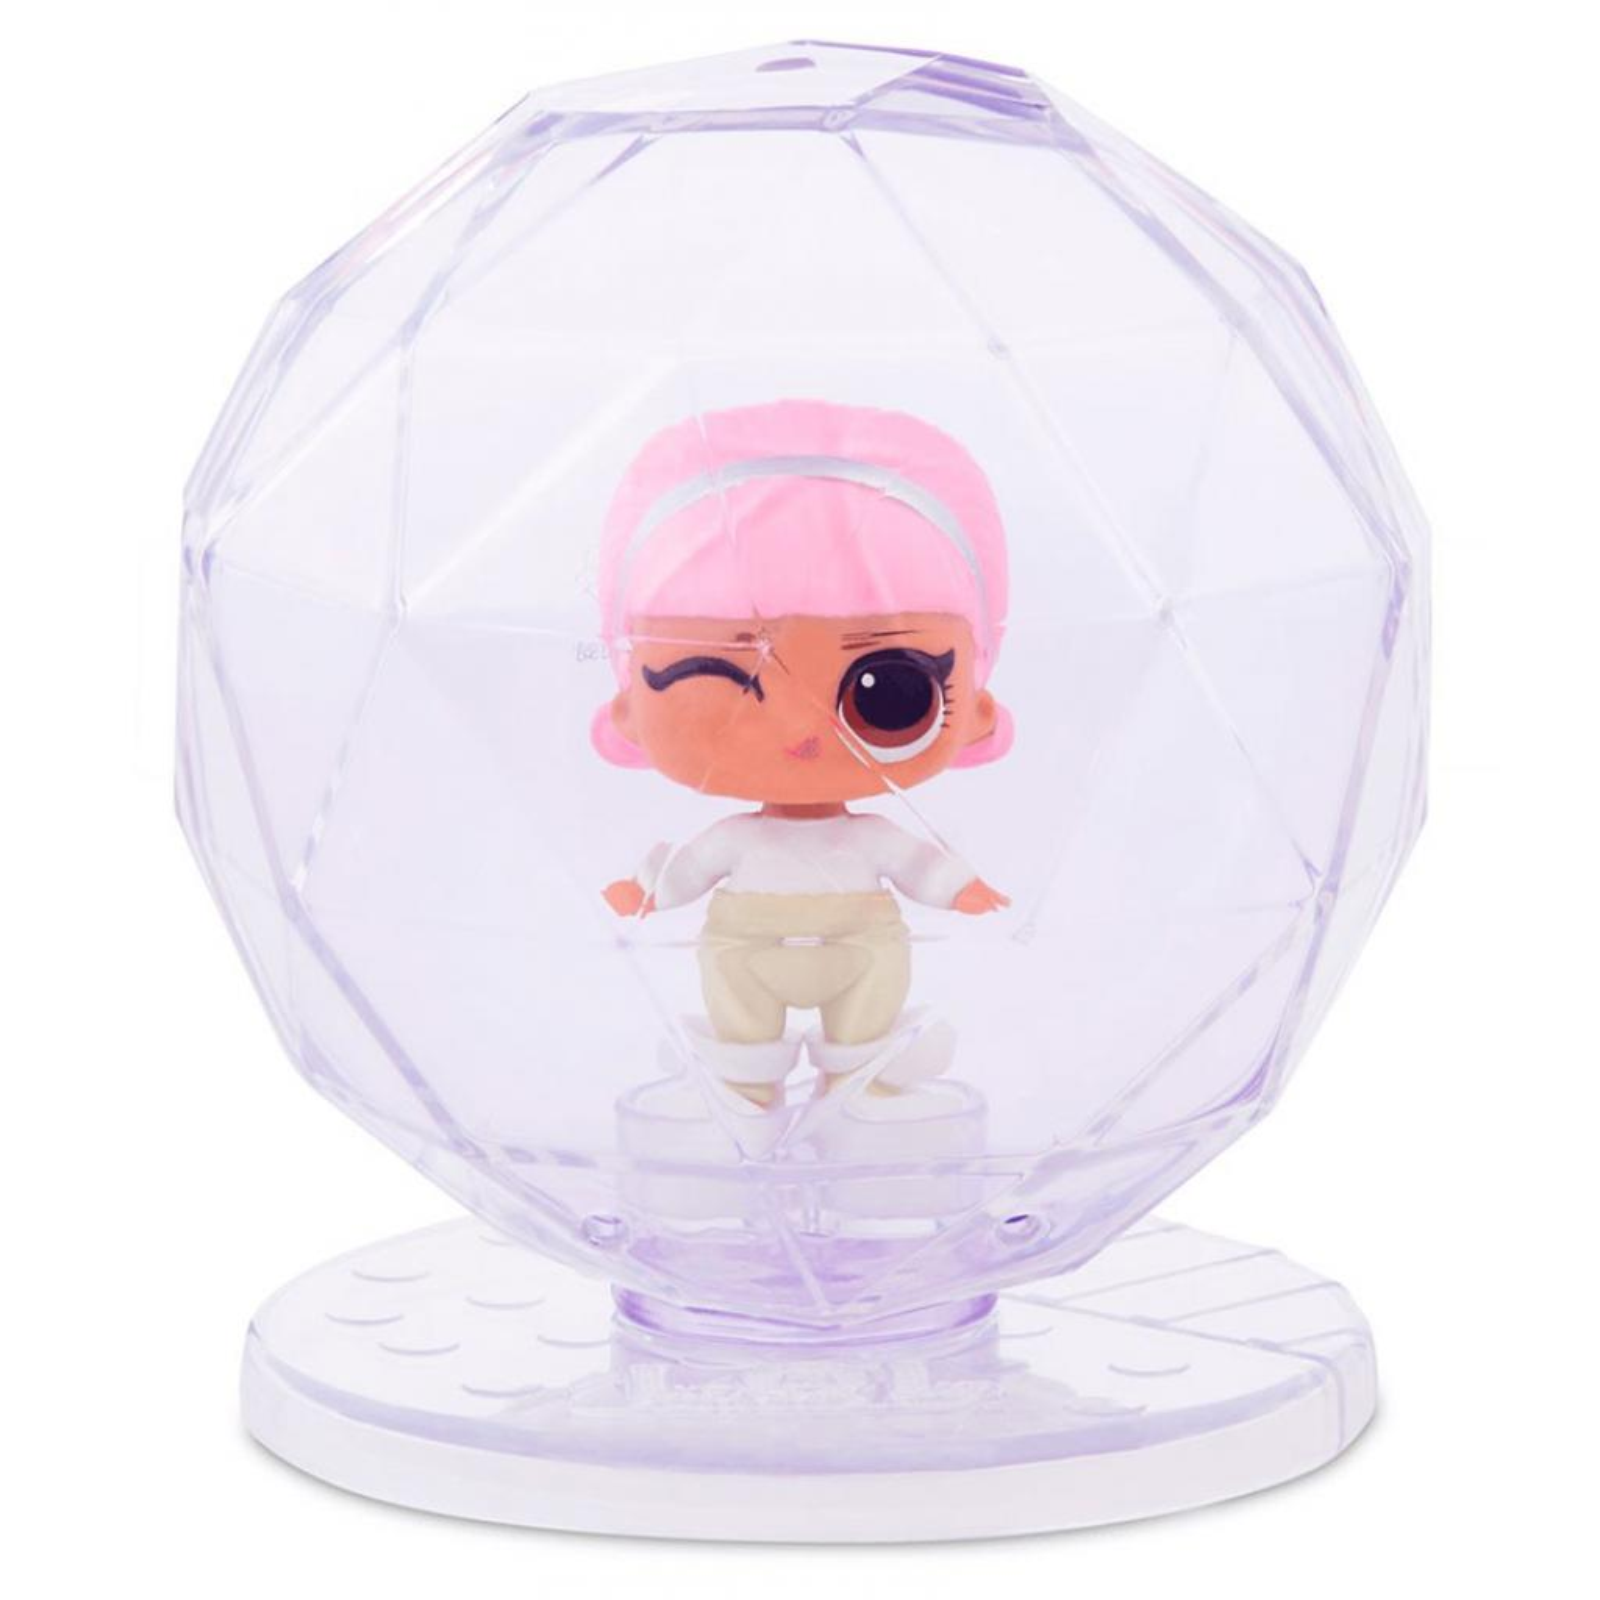 Кукла L.O.L. Surprise! серии Lil's Winter Disco - Малыши (559672) изображение 10